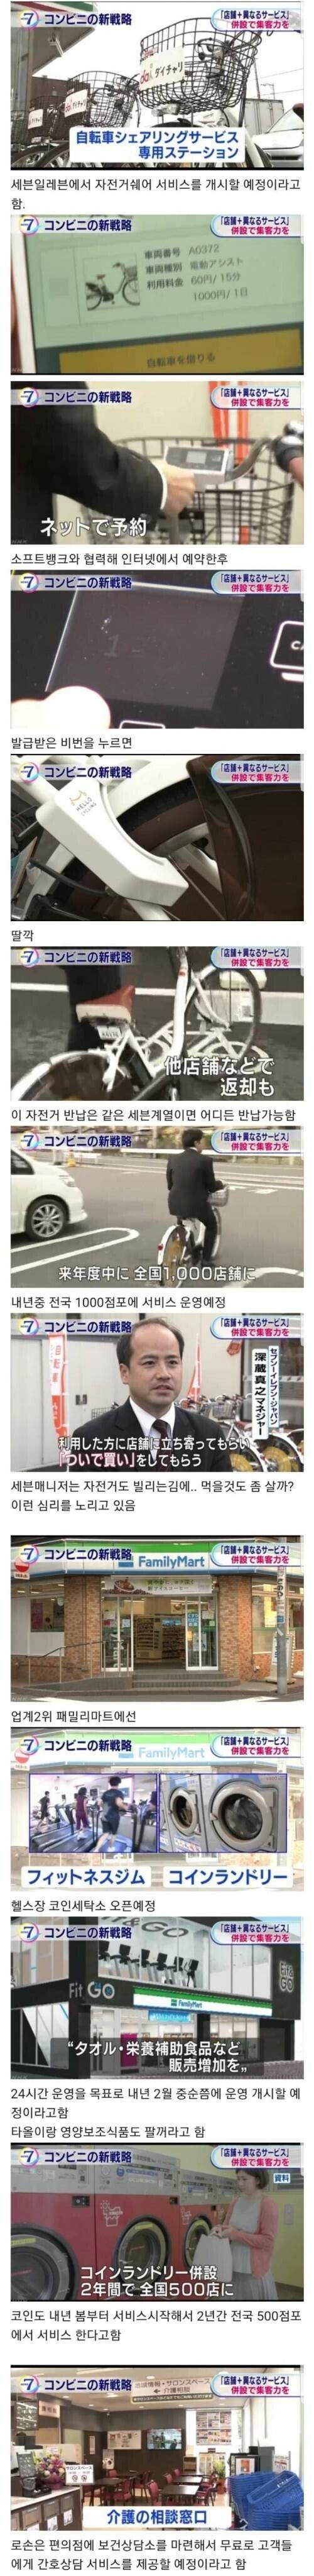 47C15E36-794C-438E-8C04-A2BEEE300FB3.jpeg 일본 편의점 근황.jpg